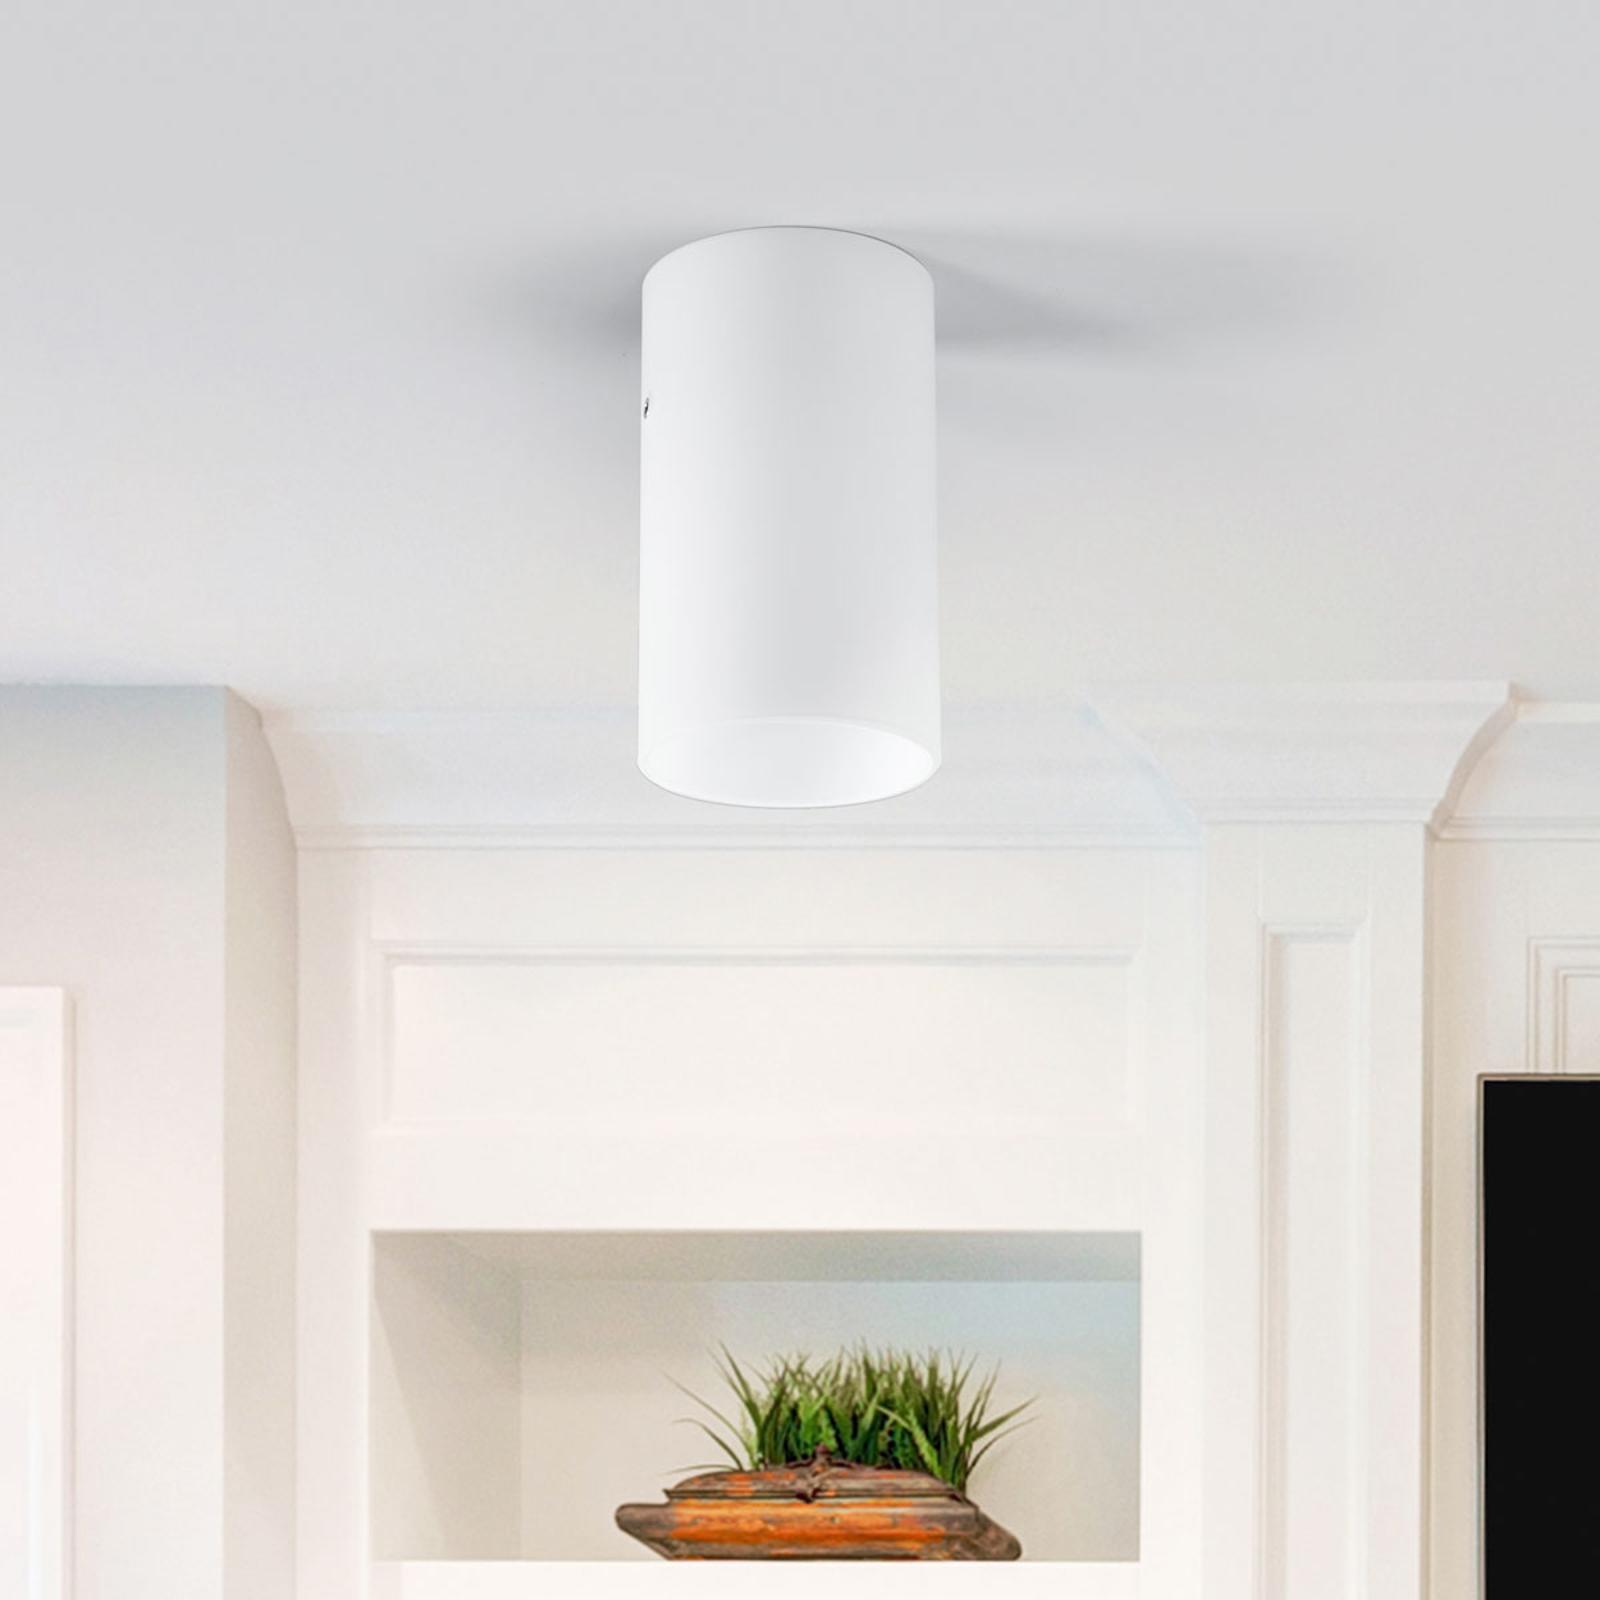 Ronde plafondlamp Tube